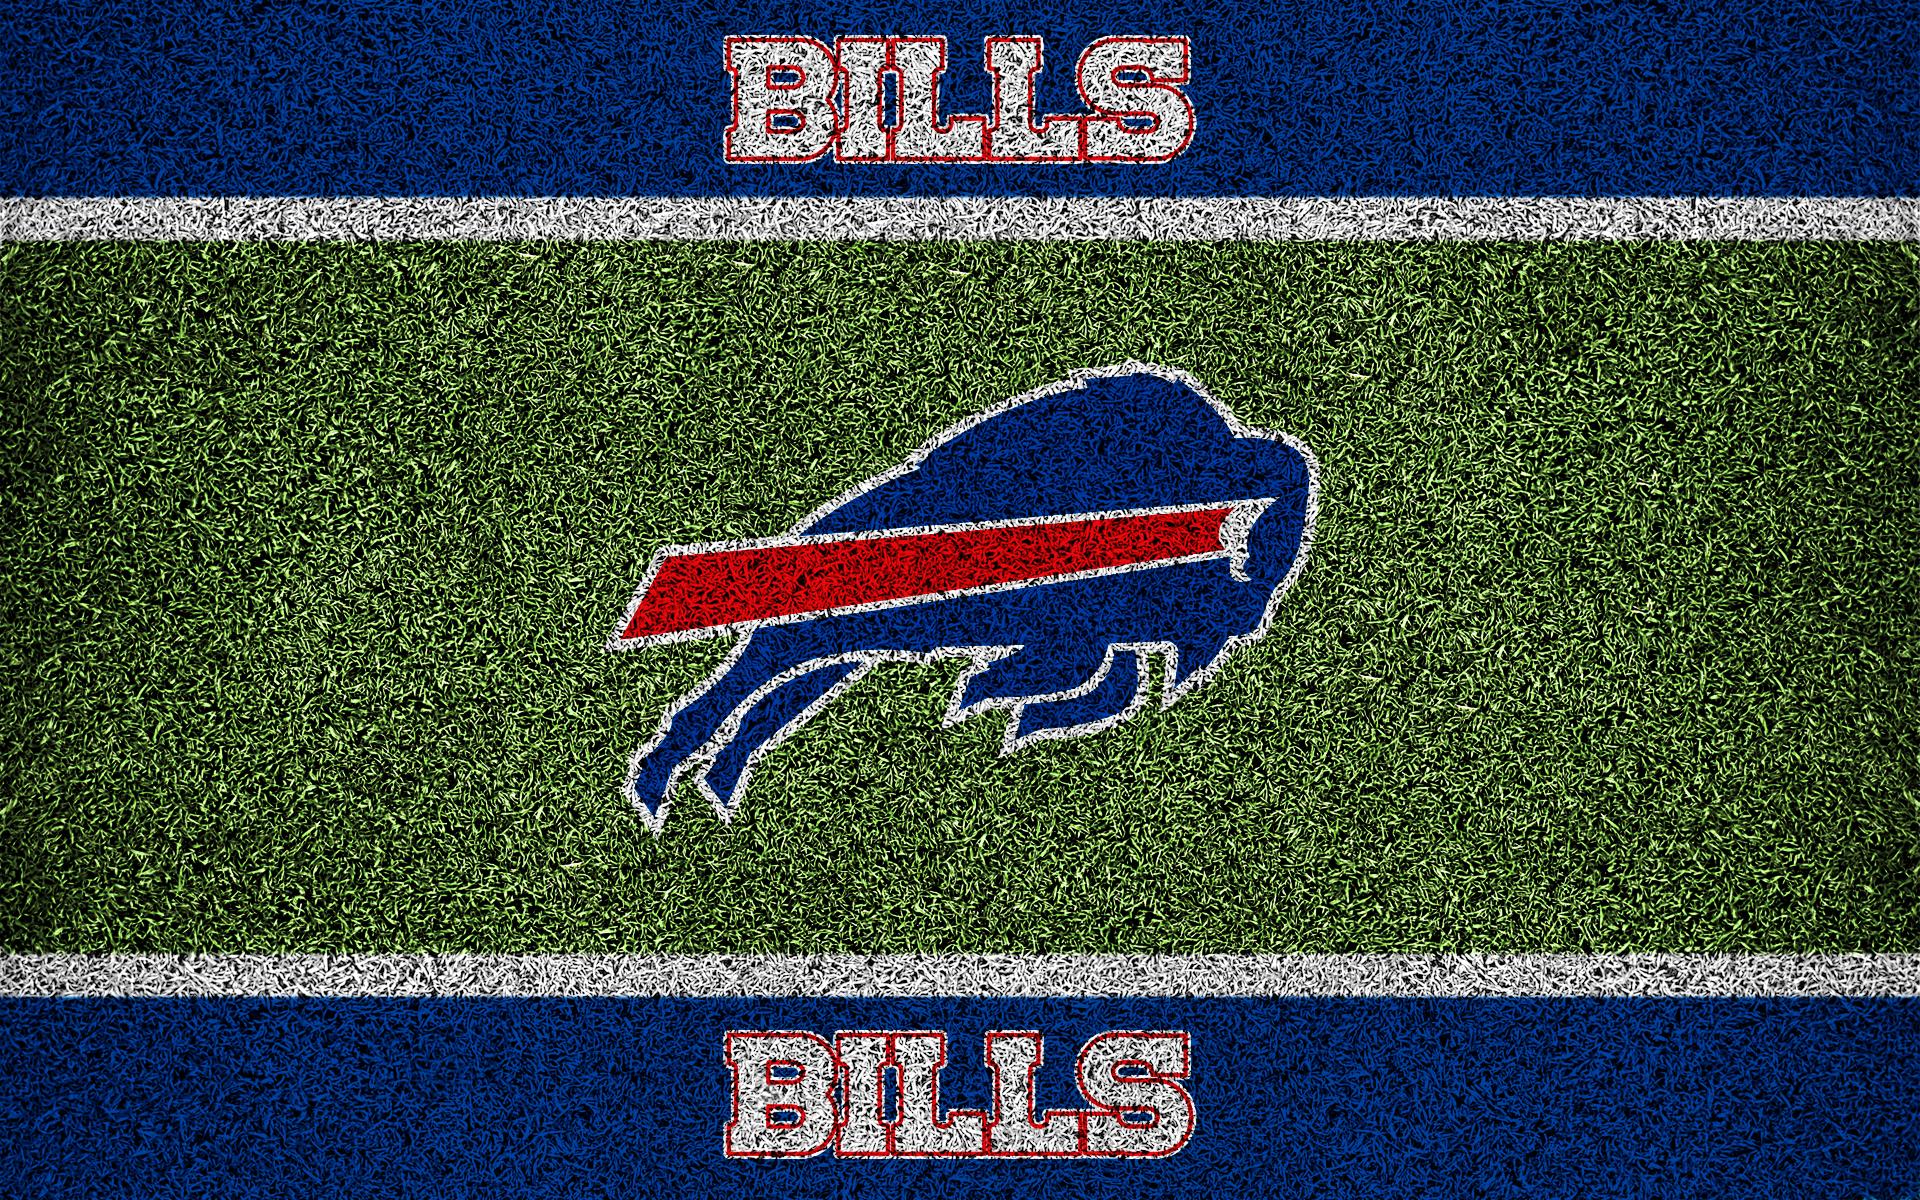 buffalo bills wallpaper Gallery 72 images 1920x1200